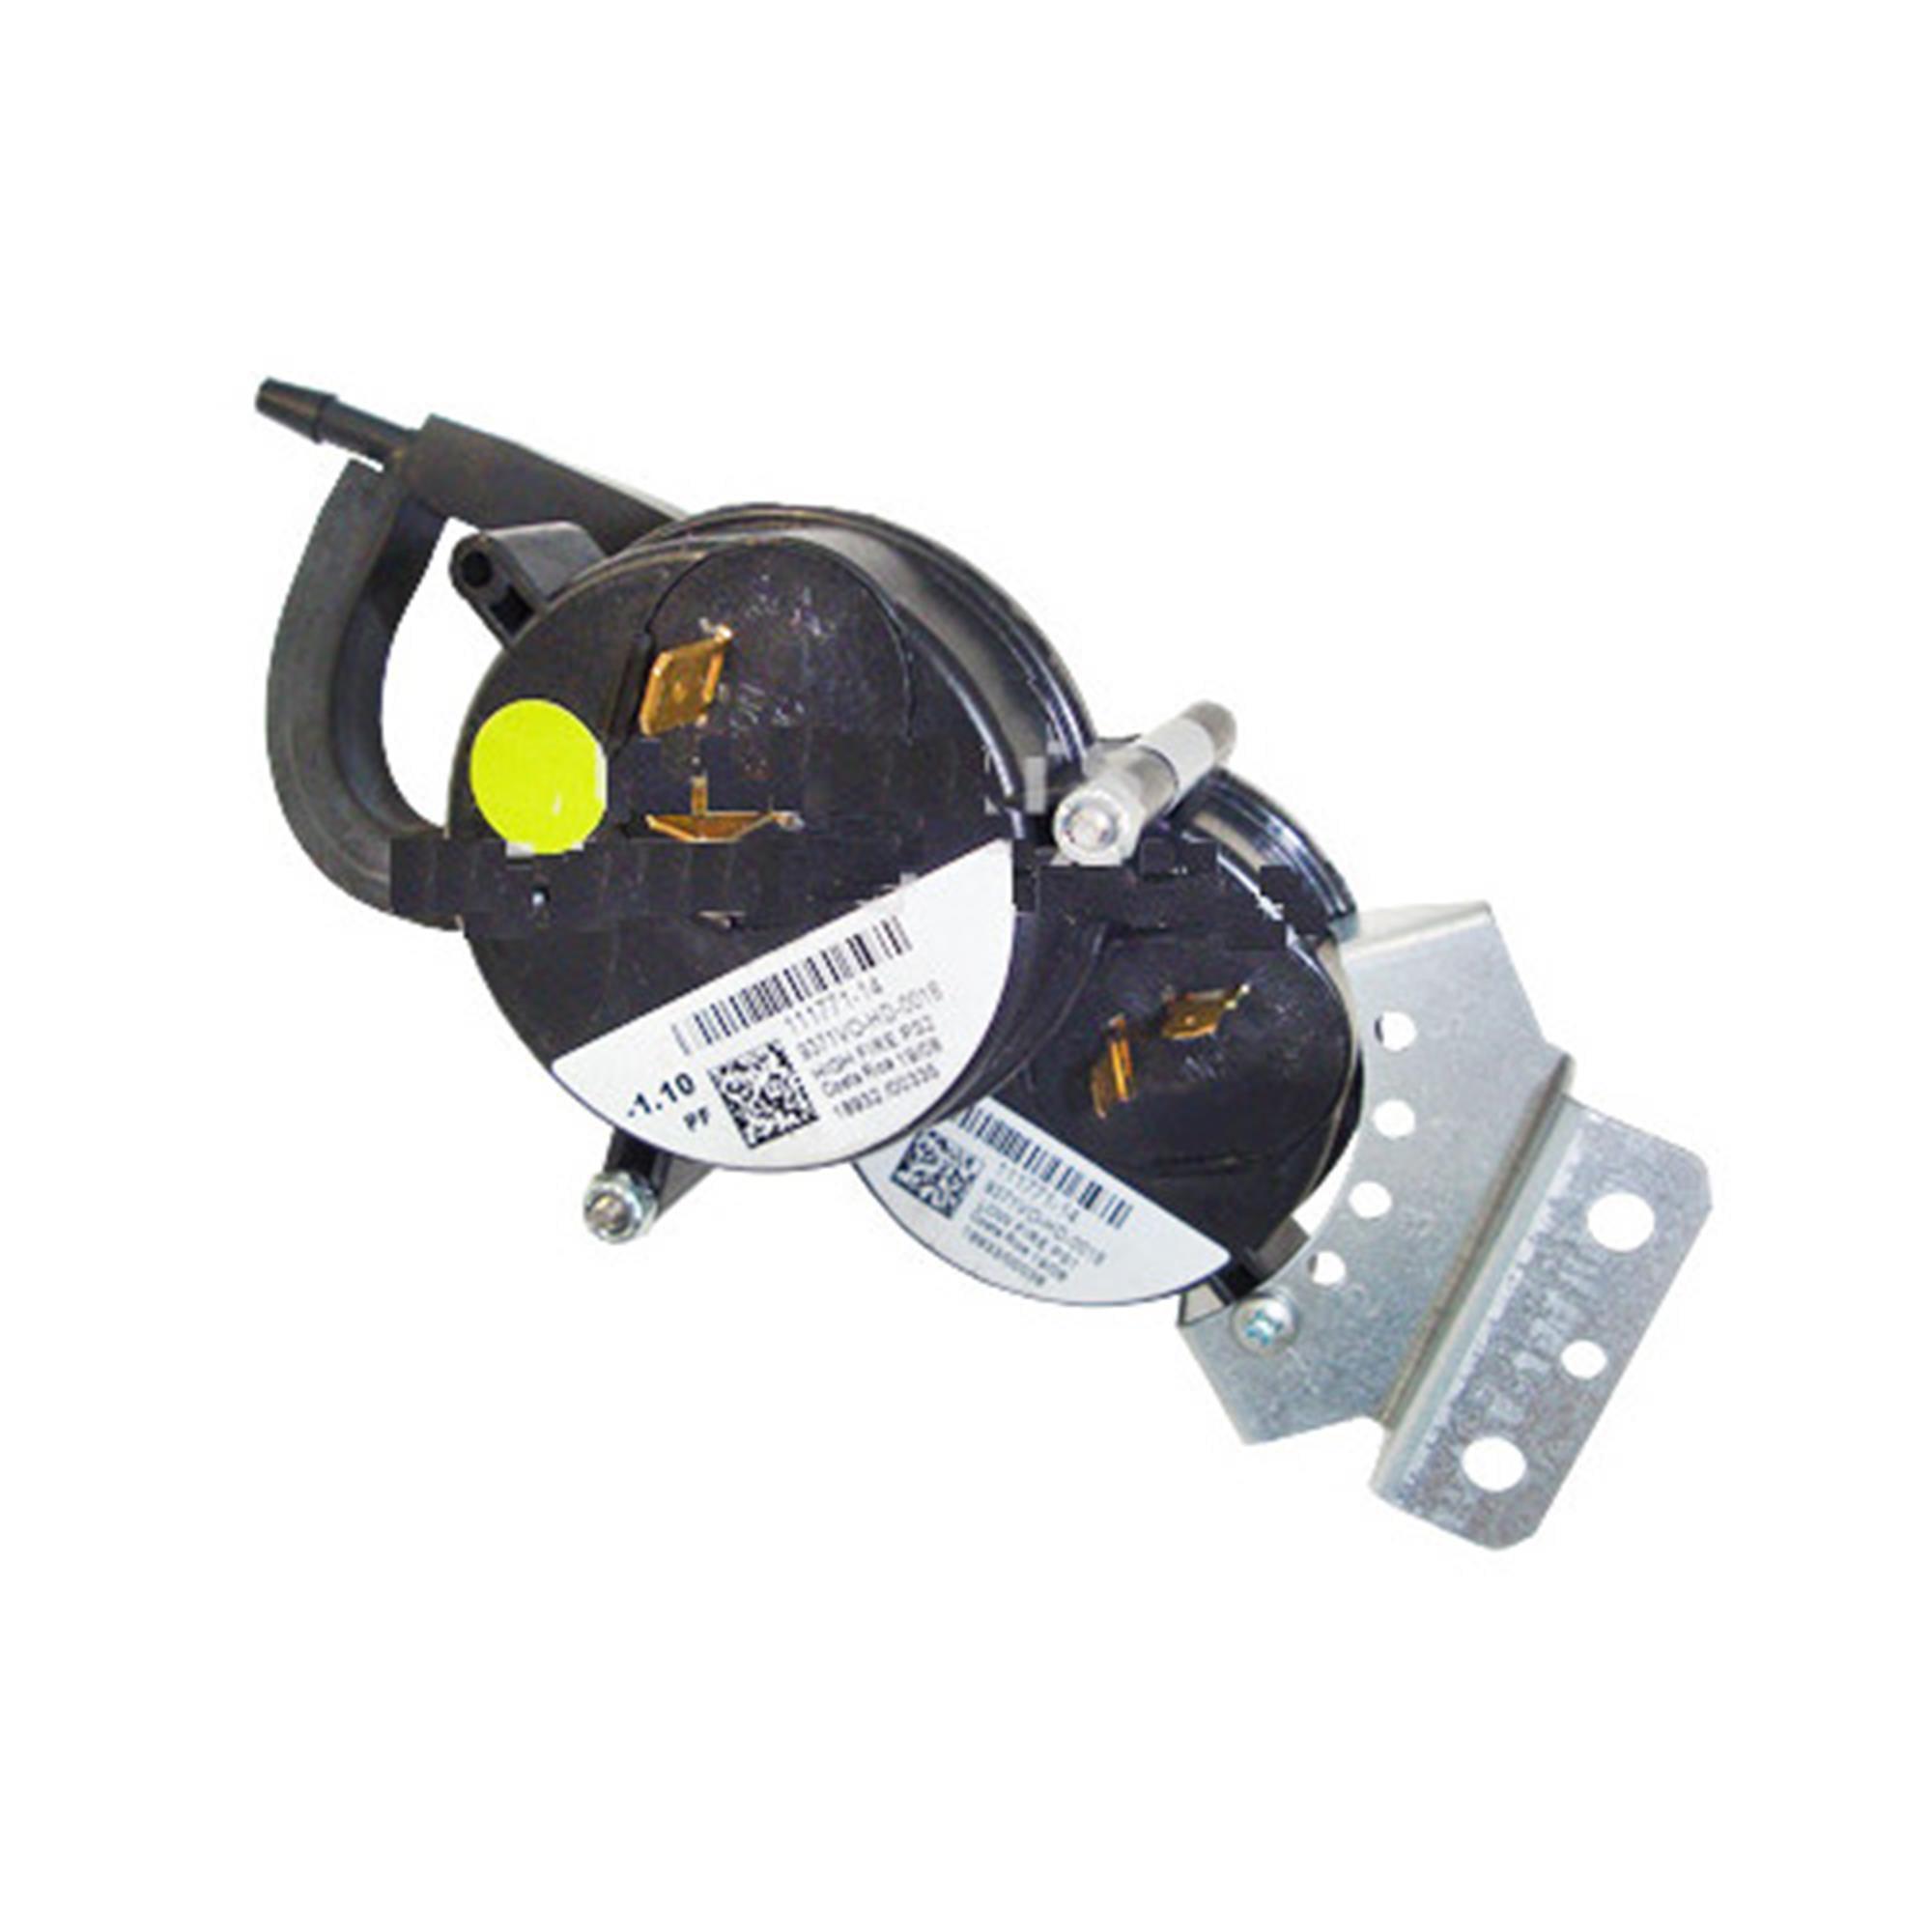 Goodmans 11177114 Goodman Air Pressure Switch DU 0.50/1.1...